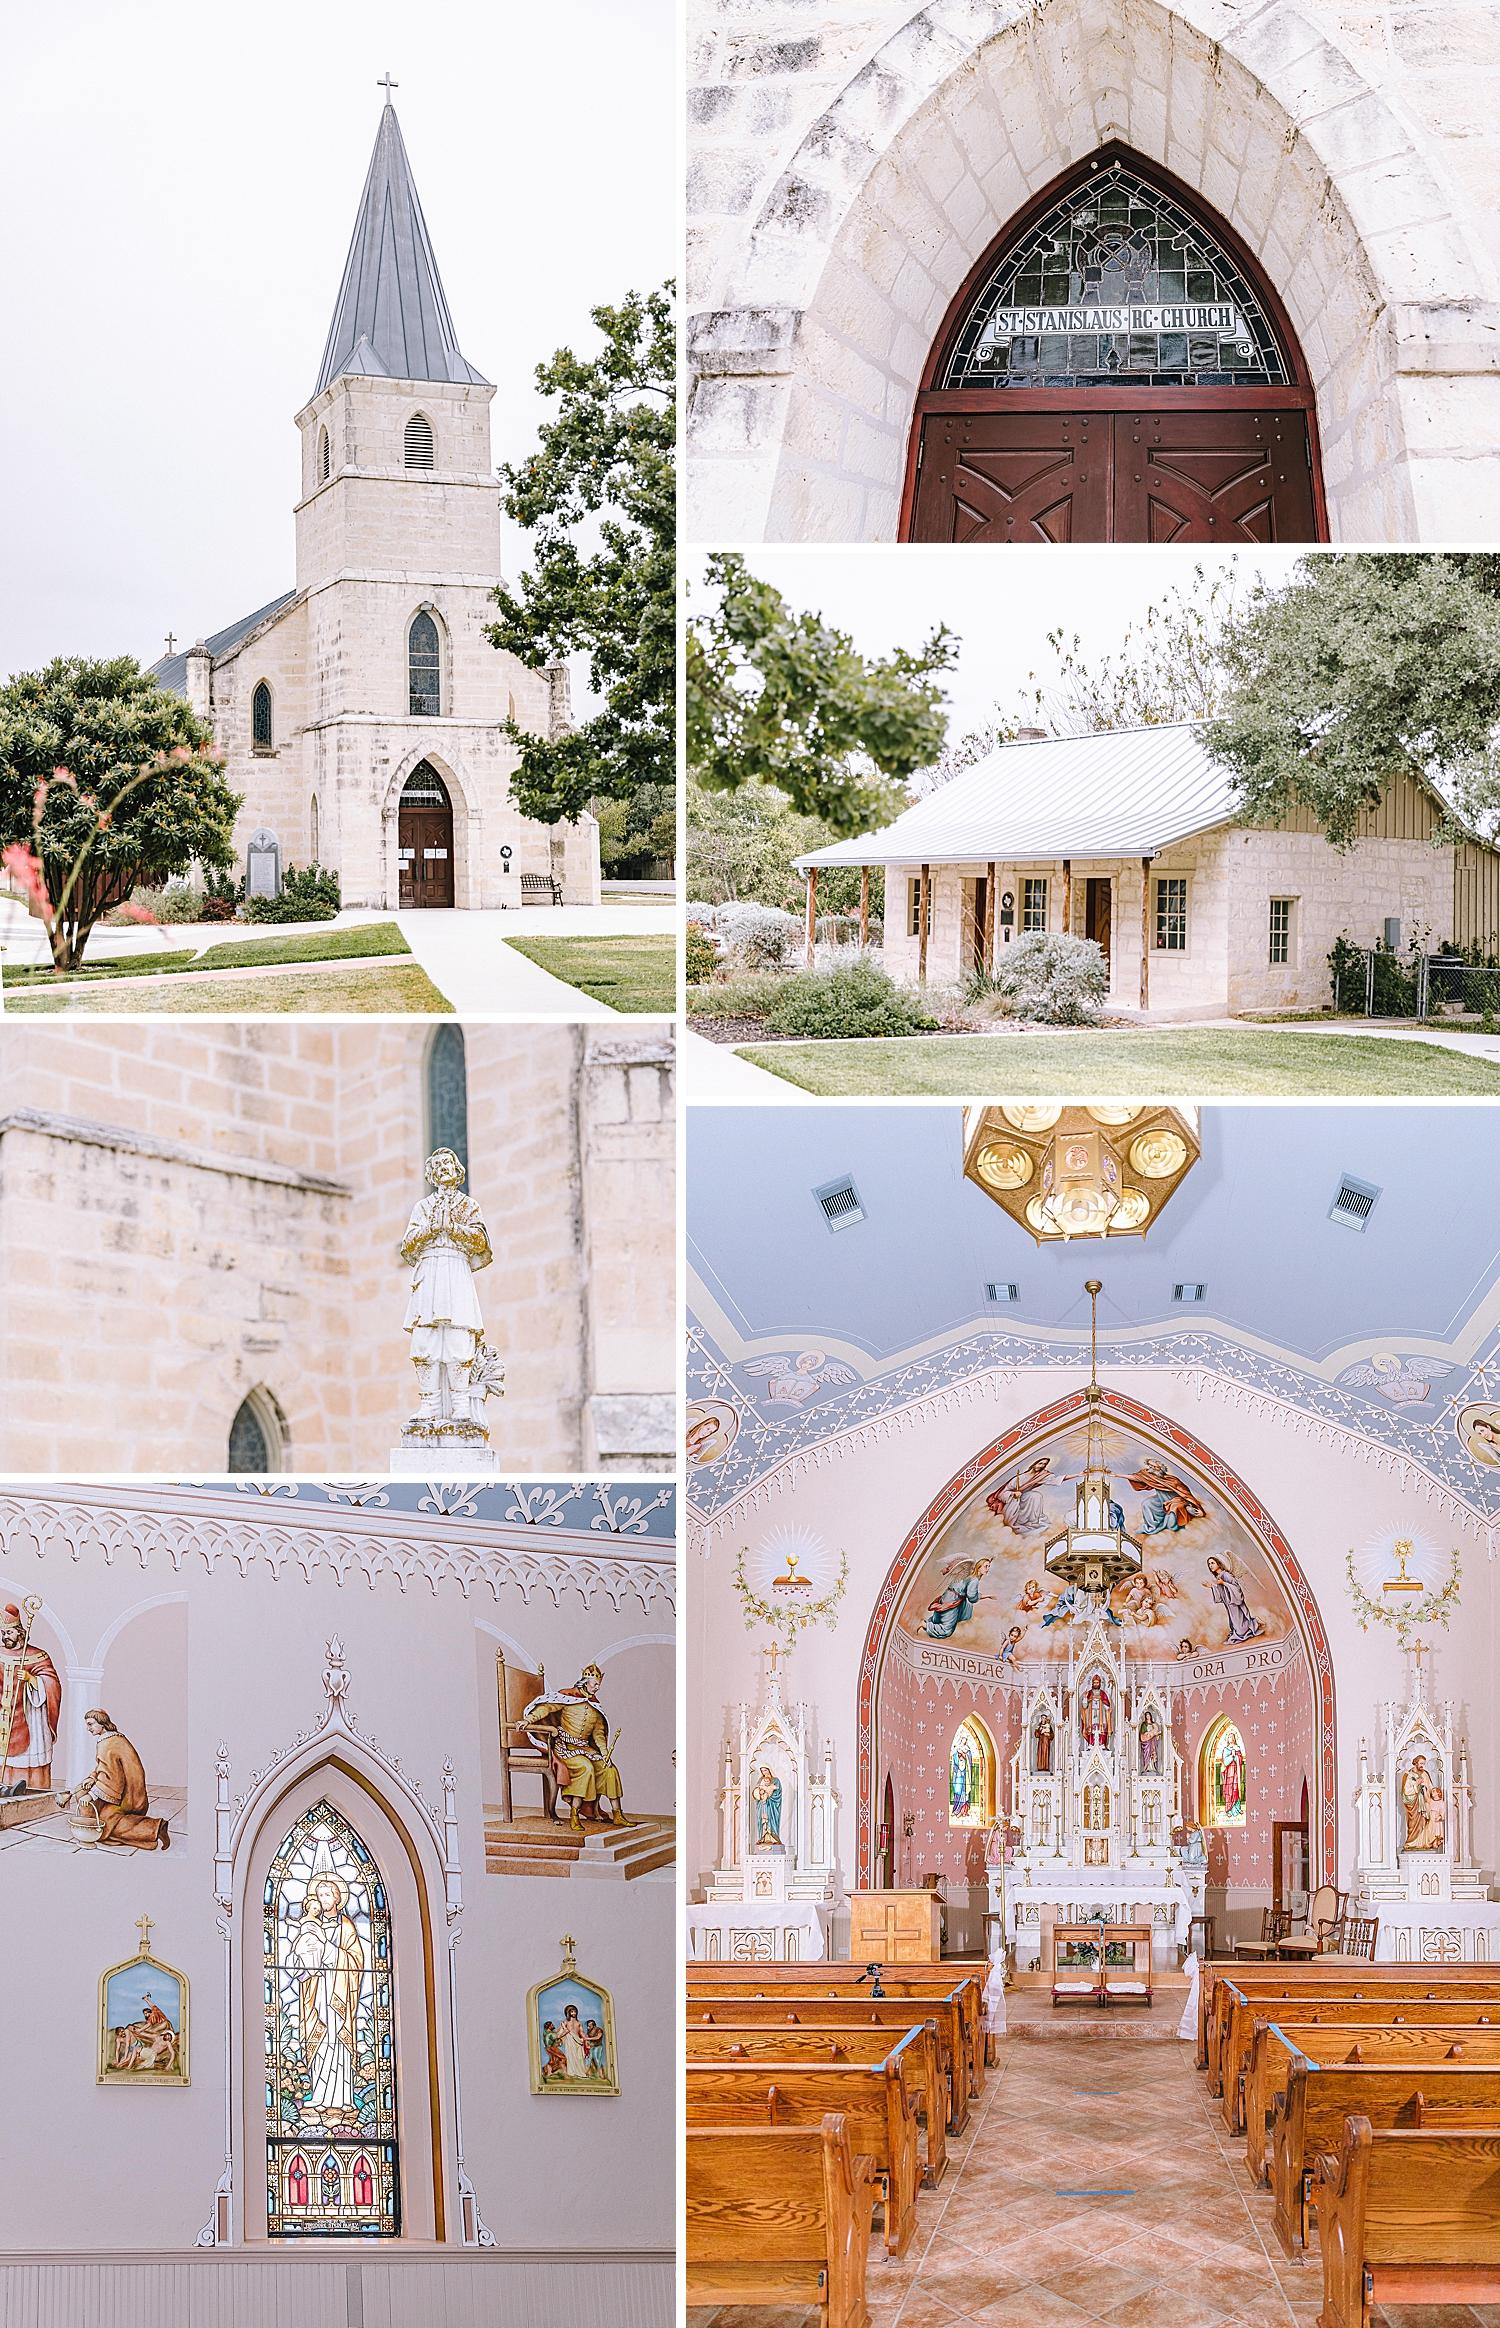 Bandera-Texas-Wedding-Photographer-Bride-Groom-on-Horses-Carly-Barton-Photography_0021.jpg